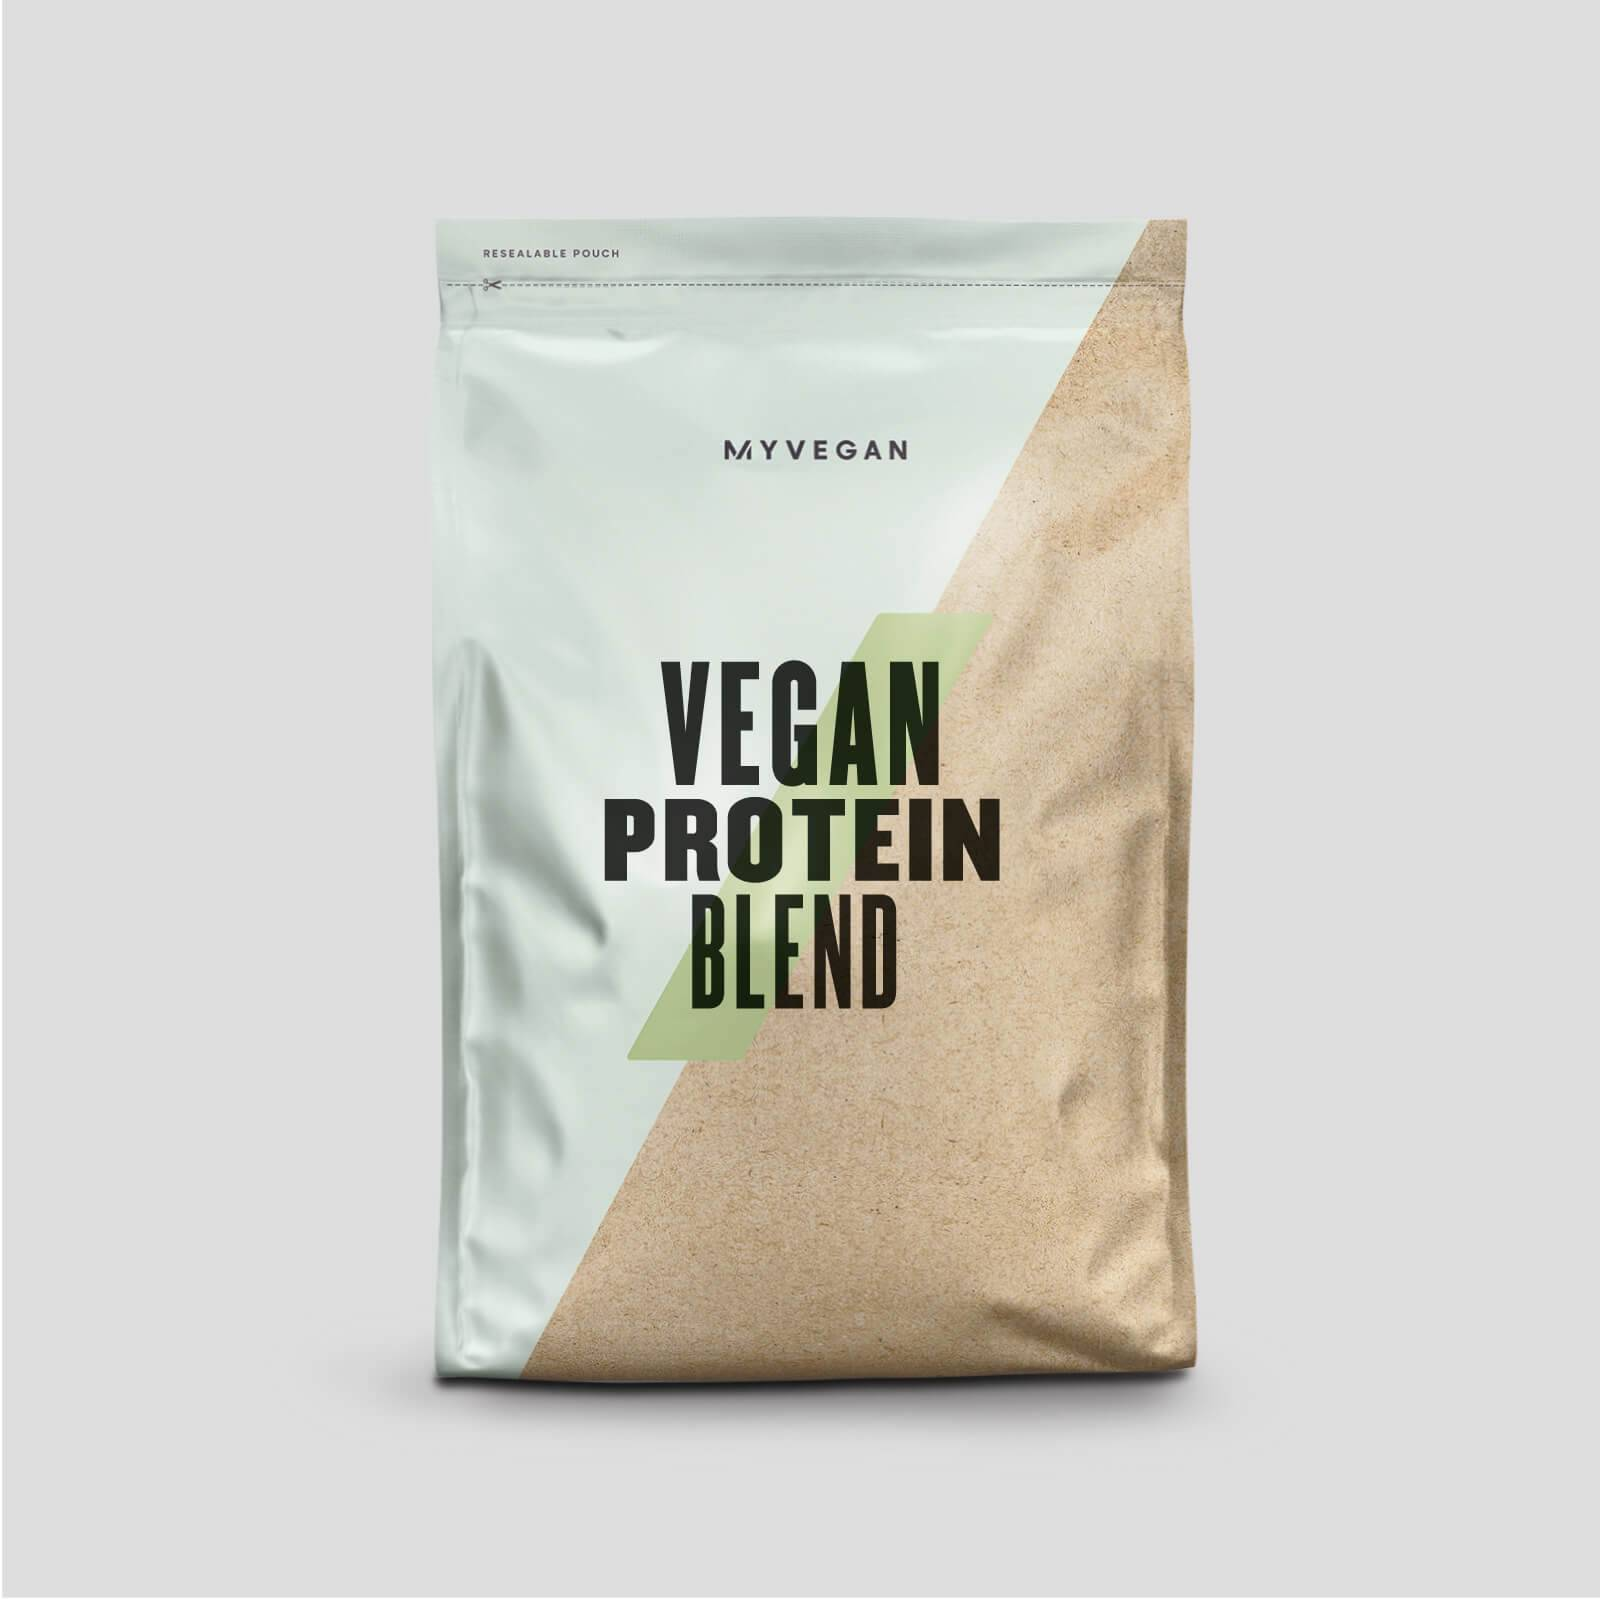 Myvegan Mélange de protéines végétales - 500g - Chocolat